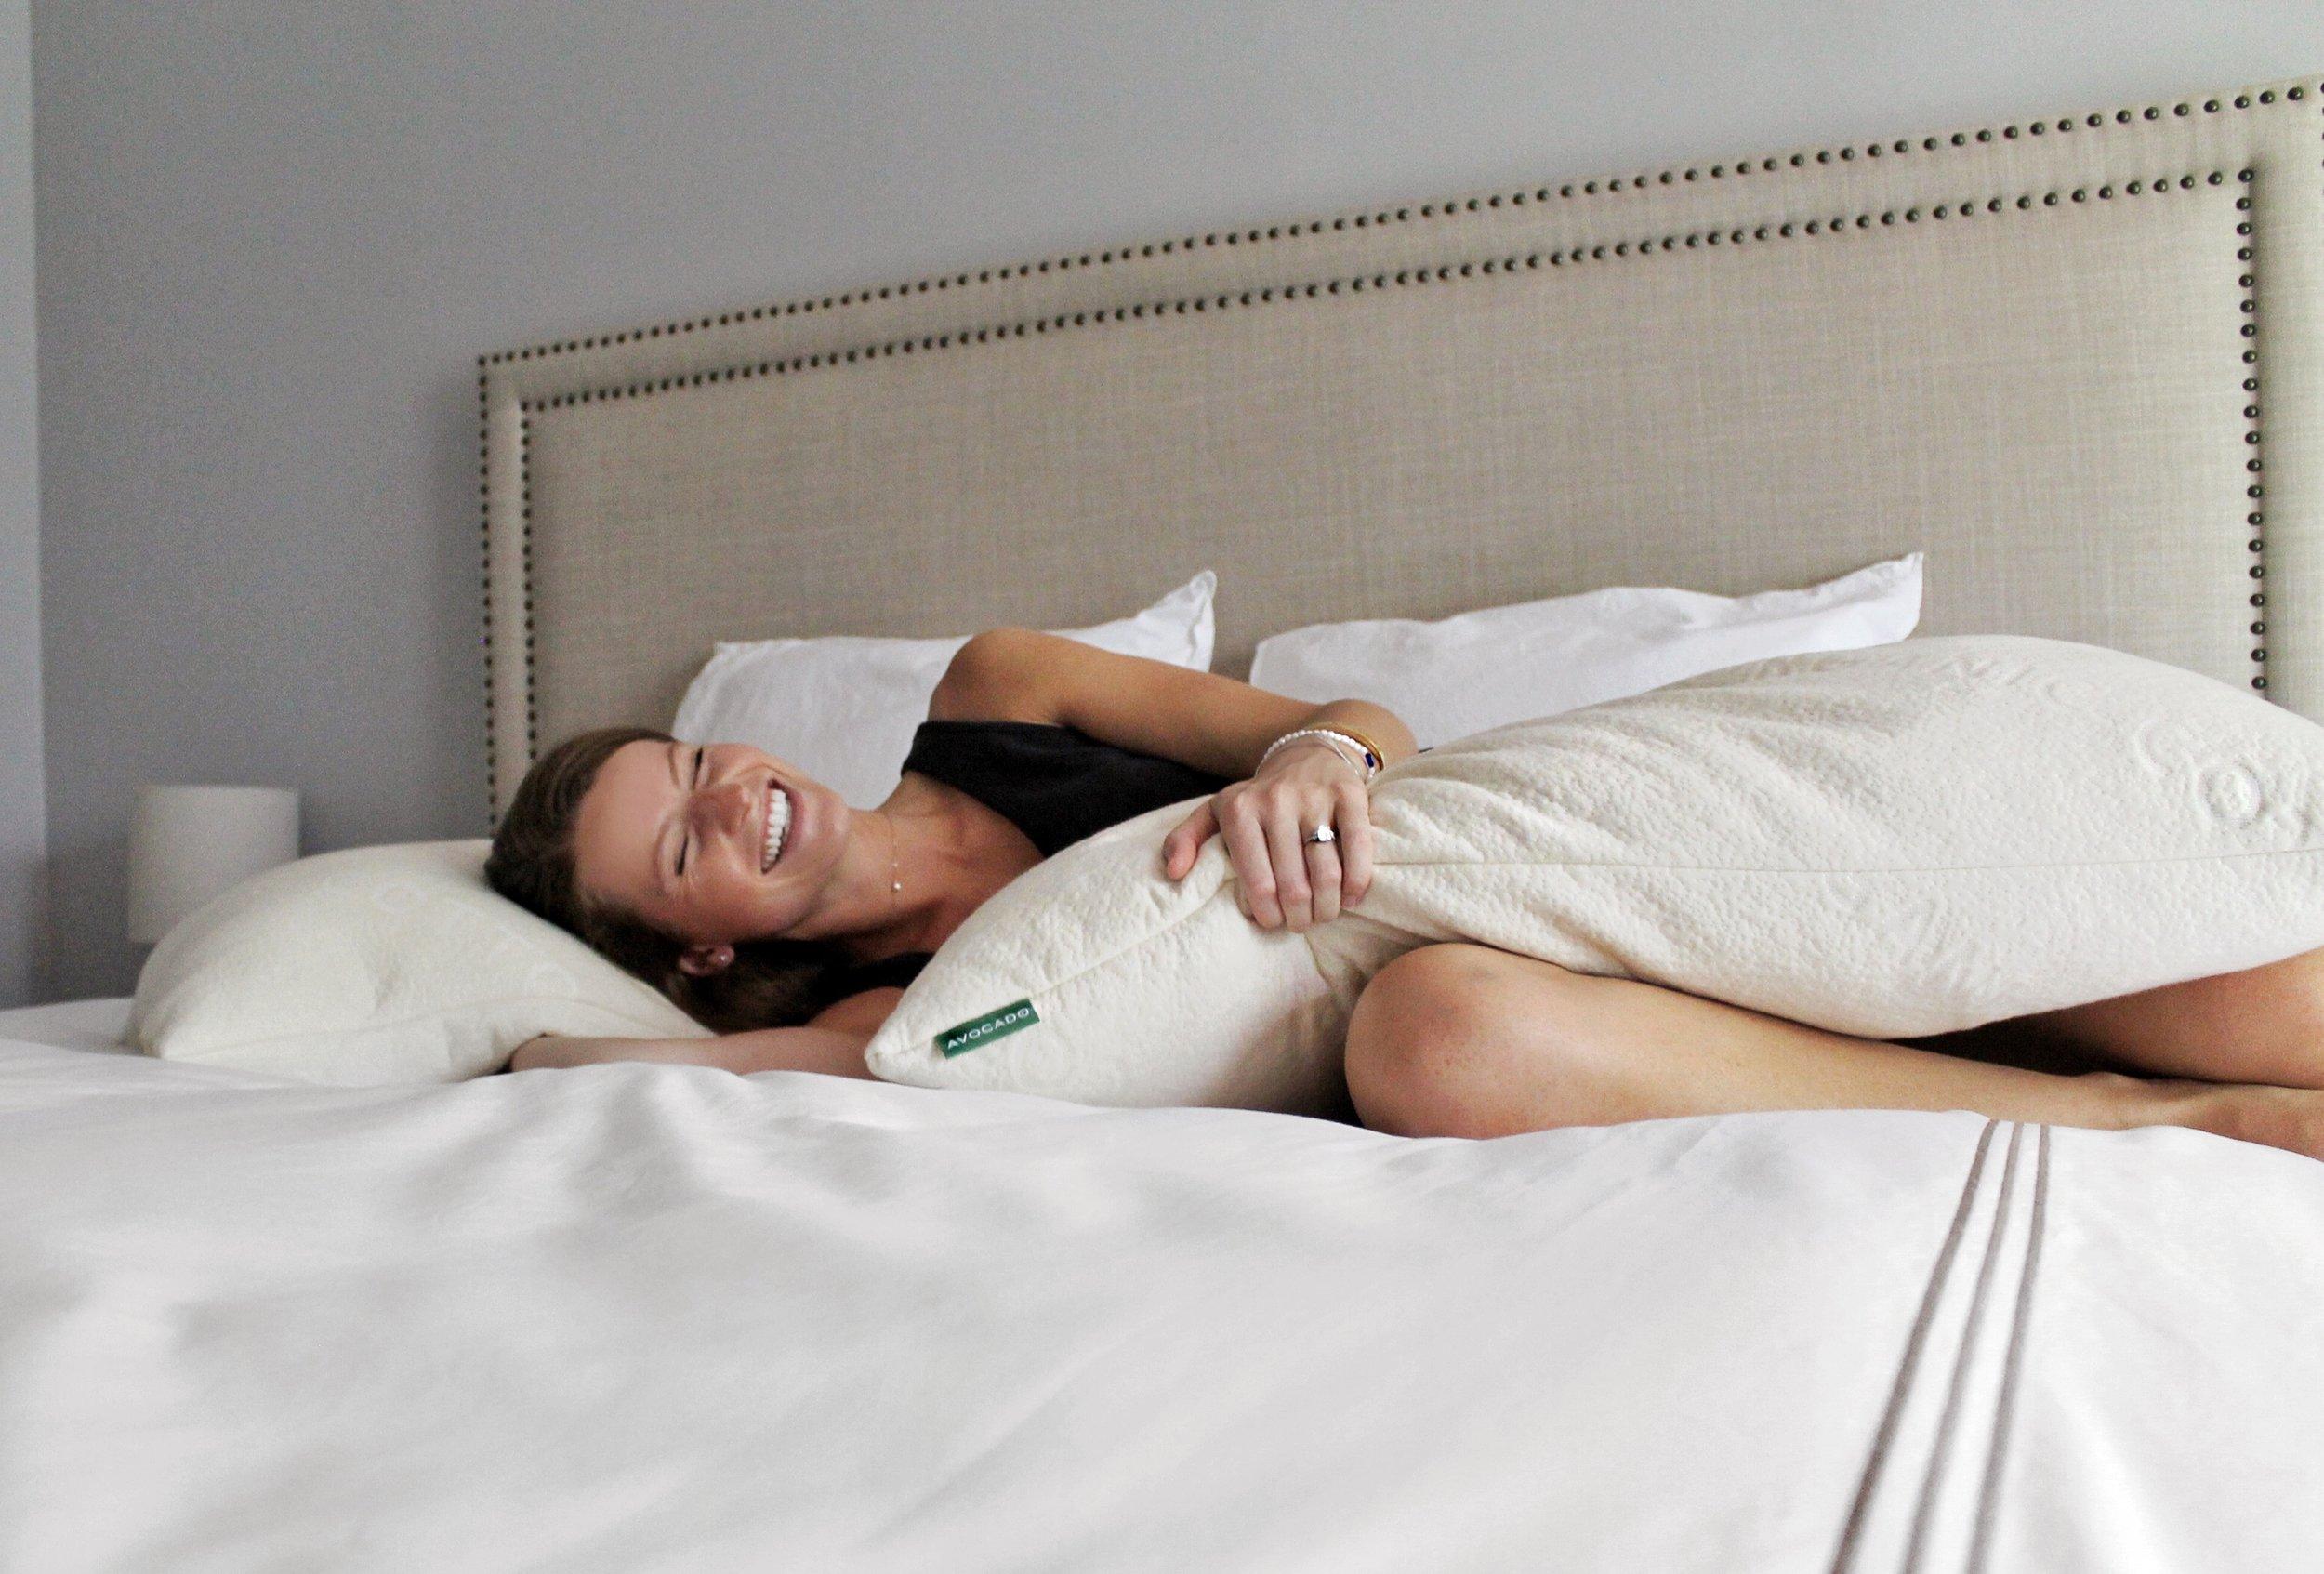 avocado green mattress pillows one